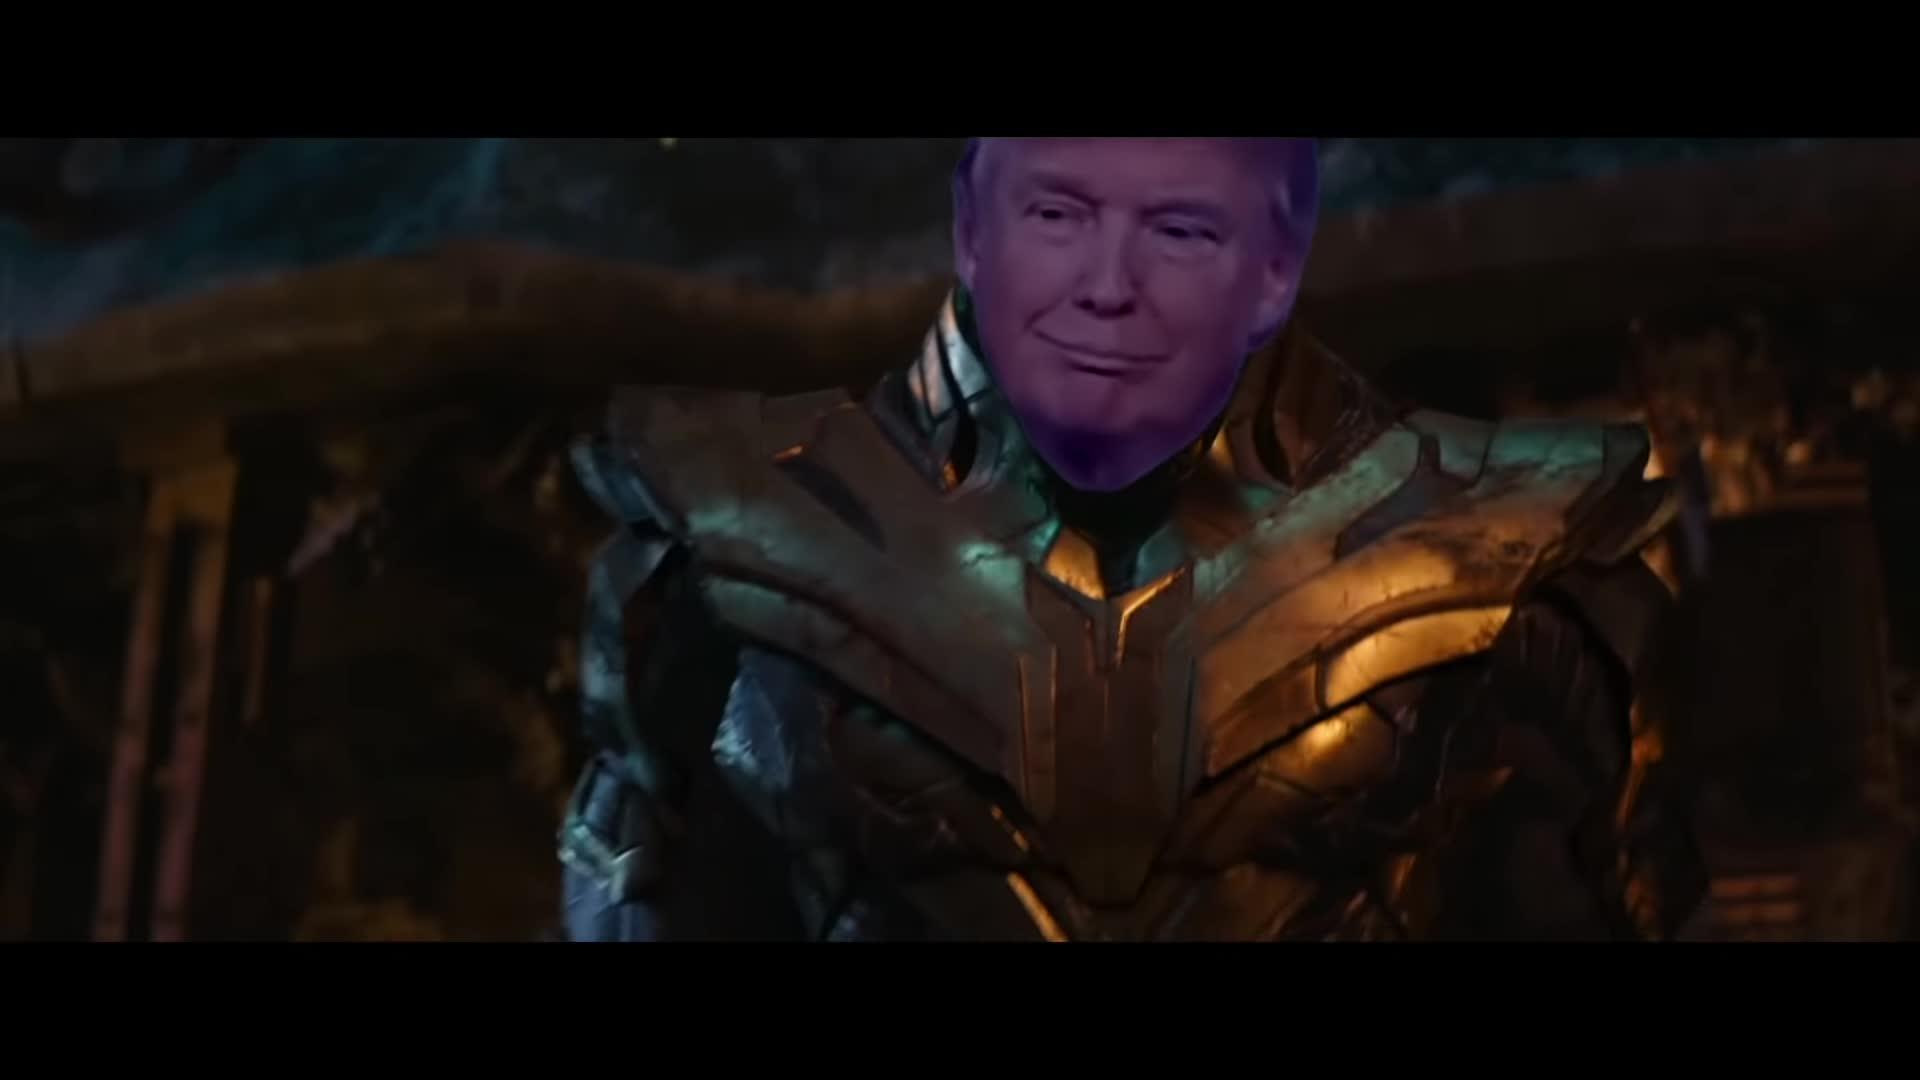 TheGeekzTeam, avengers, avengers memes, fakes news memes, memes, thanos memes, thanos trump, trump, trump memes, trump train, obama bitch yo GIFs